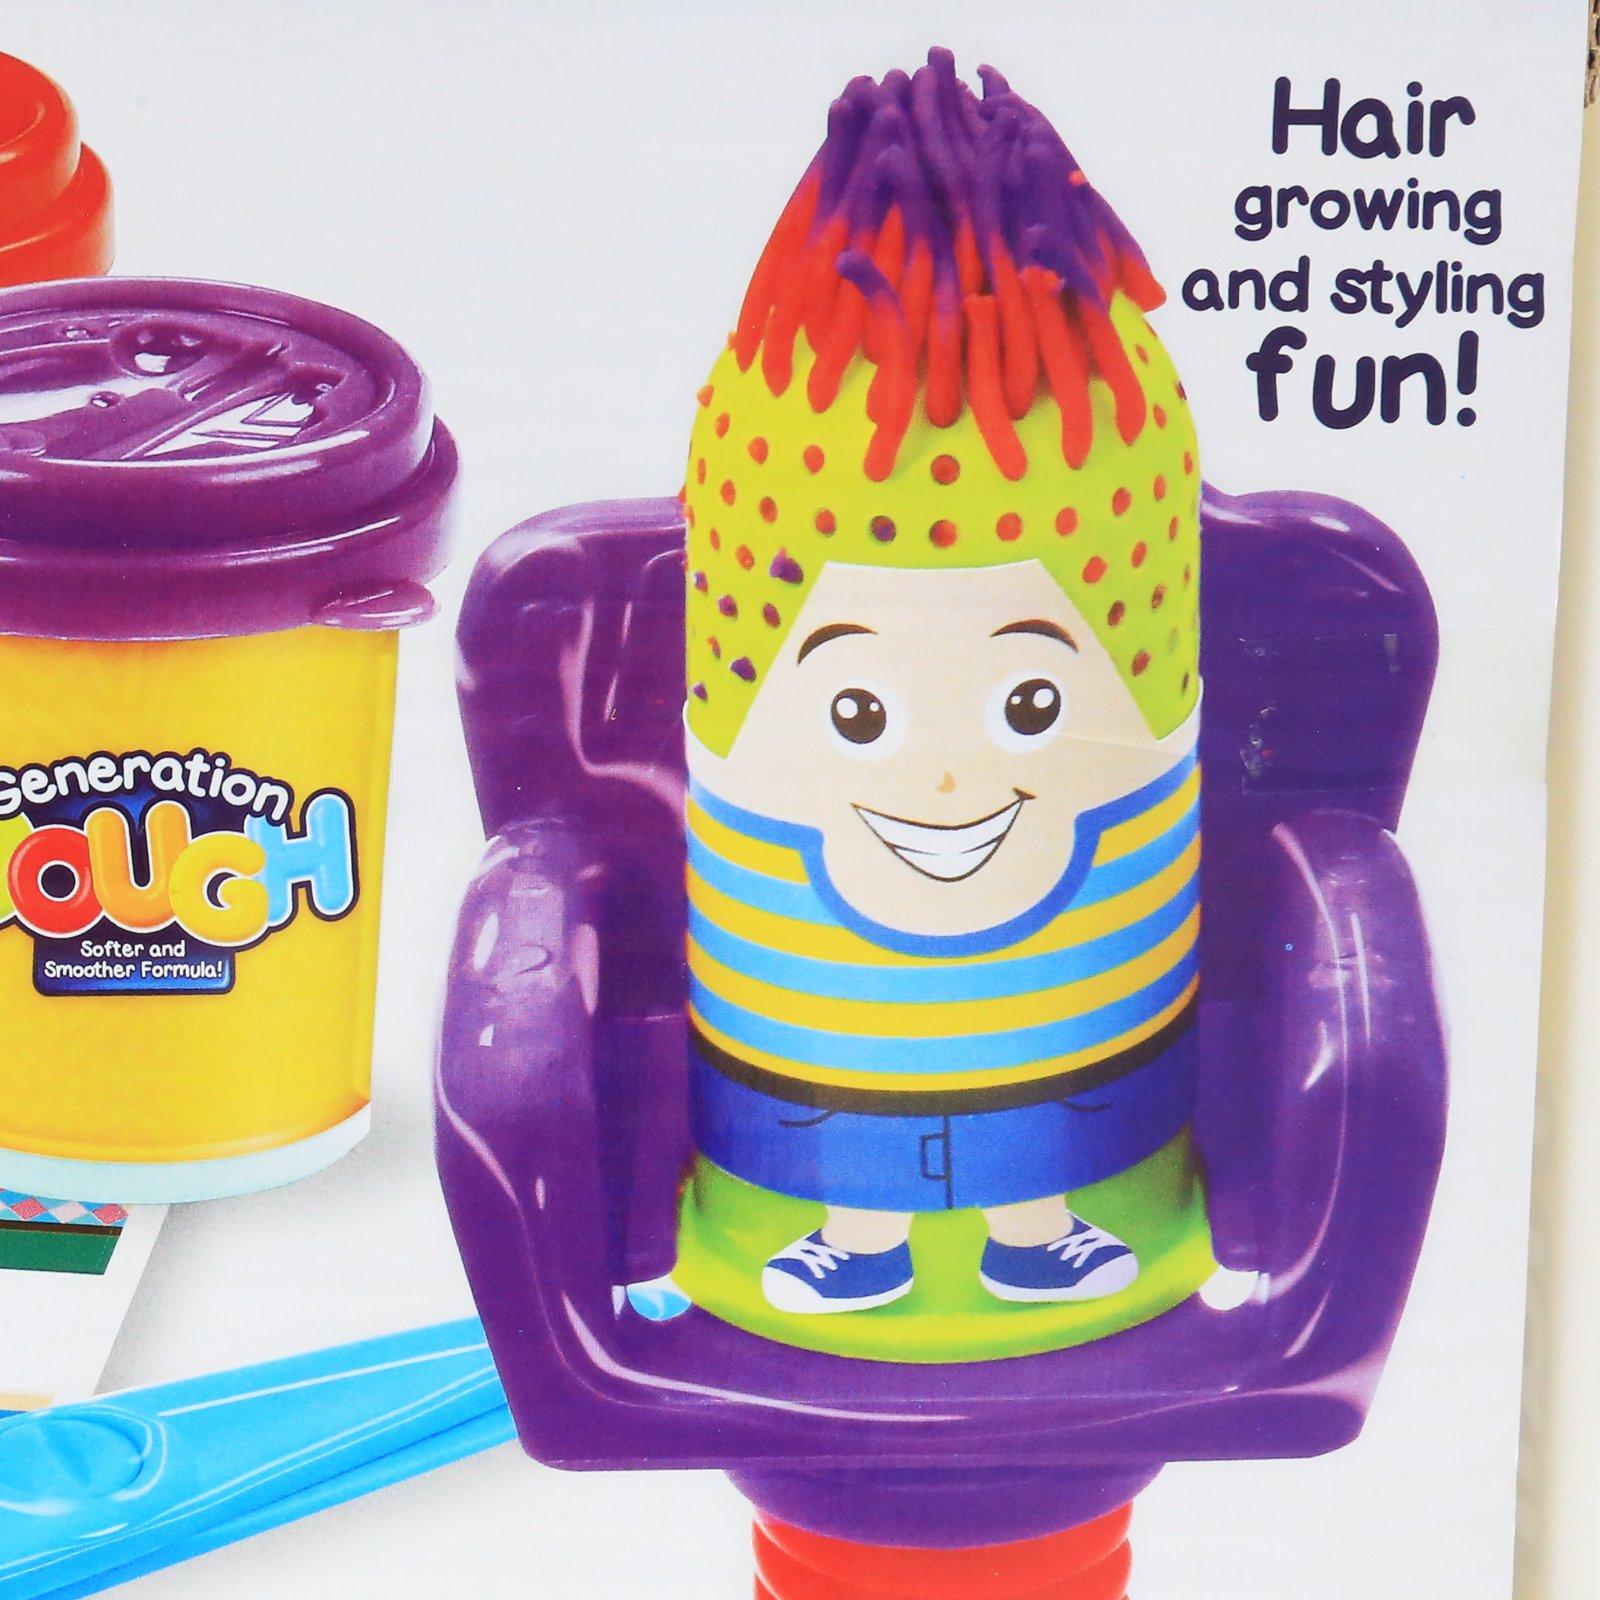 Generation Dough Hair Salon Kids Play Dough Hair Growing Styling Activity Set